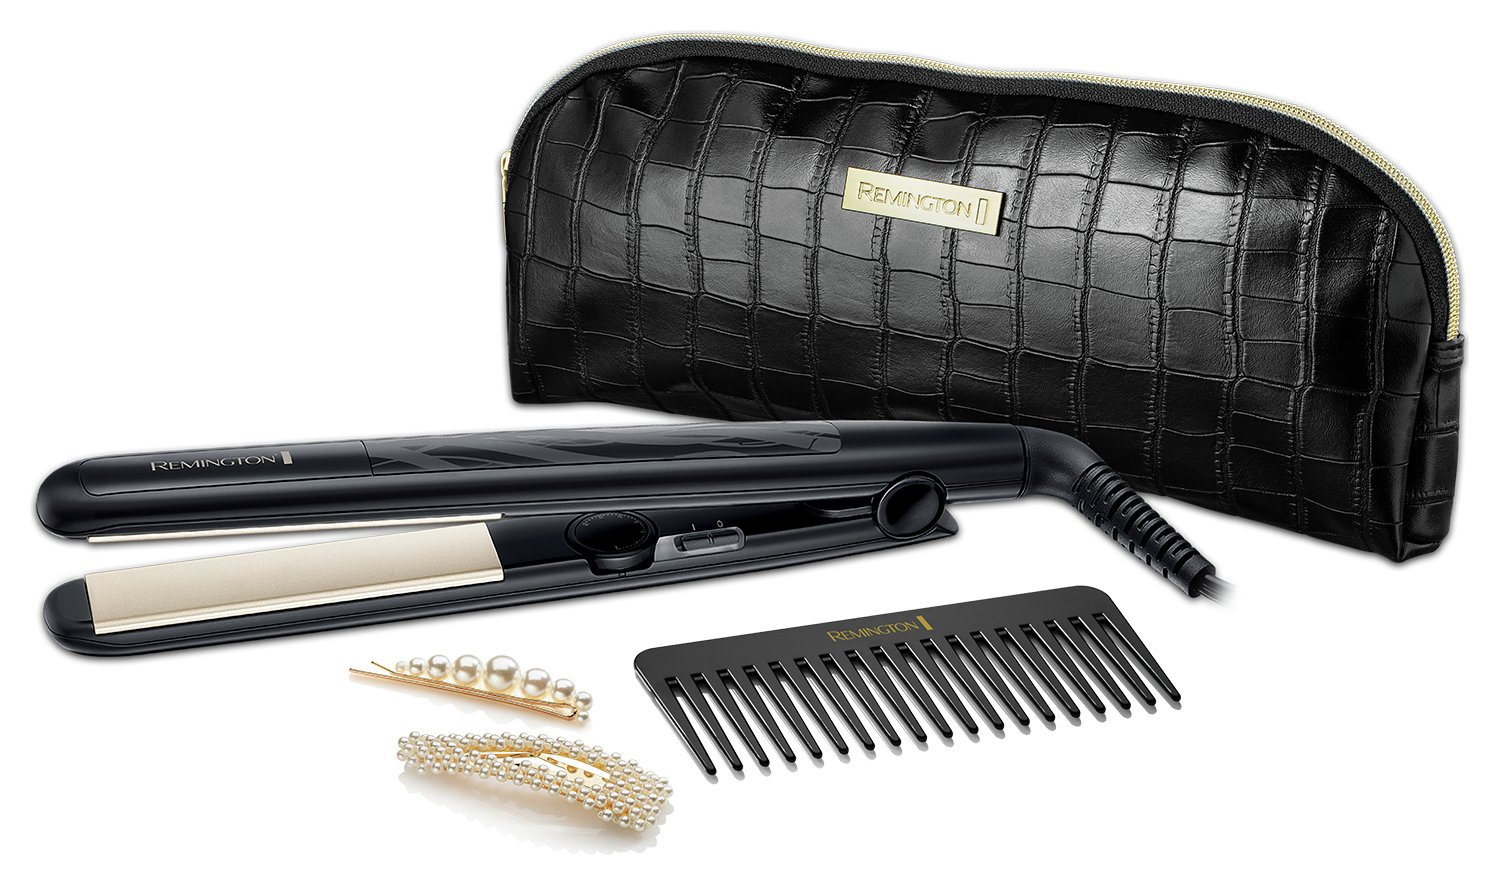 Remington S3505GP Style Edition Hair Straightener Gift Set